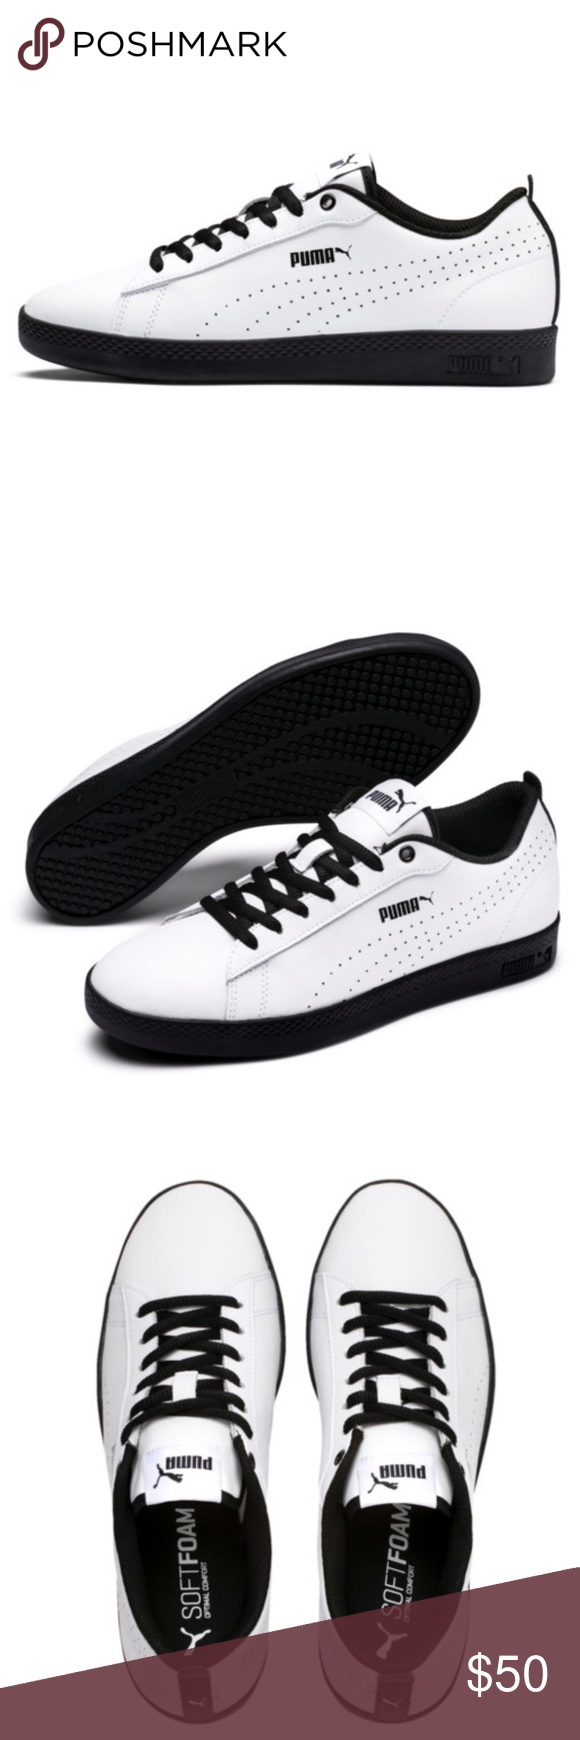 2a28a376a3a PUMA Smash V2 L Perf Tennis Sneakers Shoes White Brand new in original box